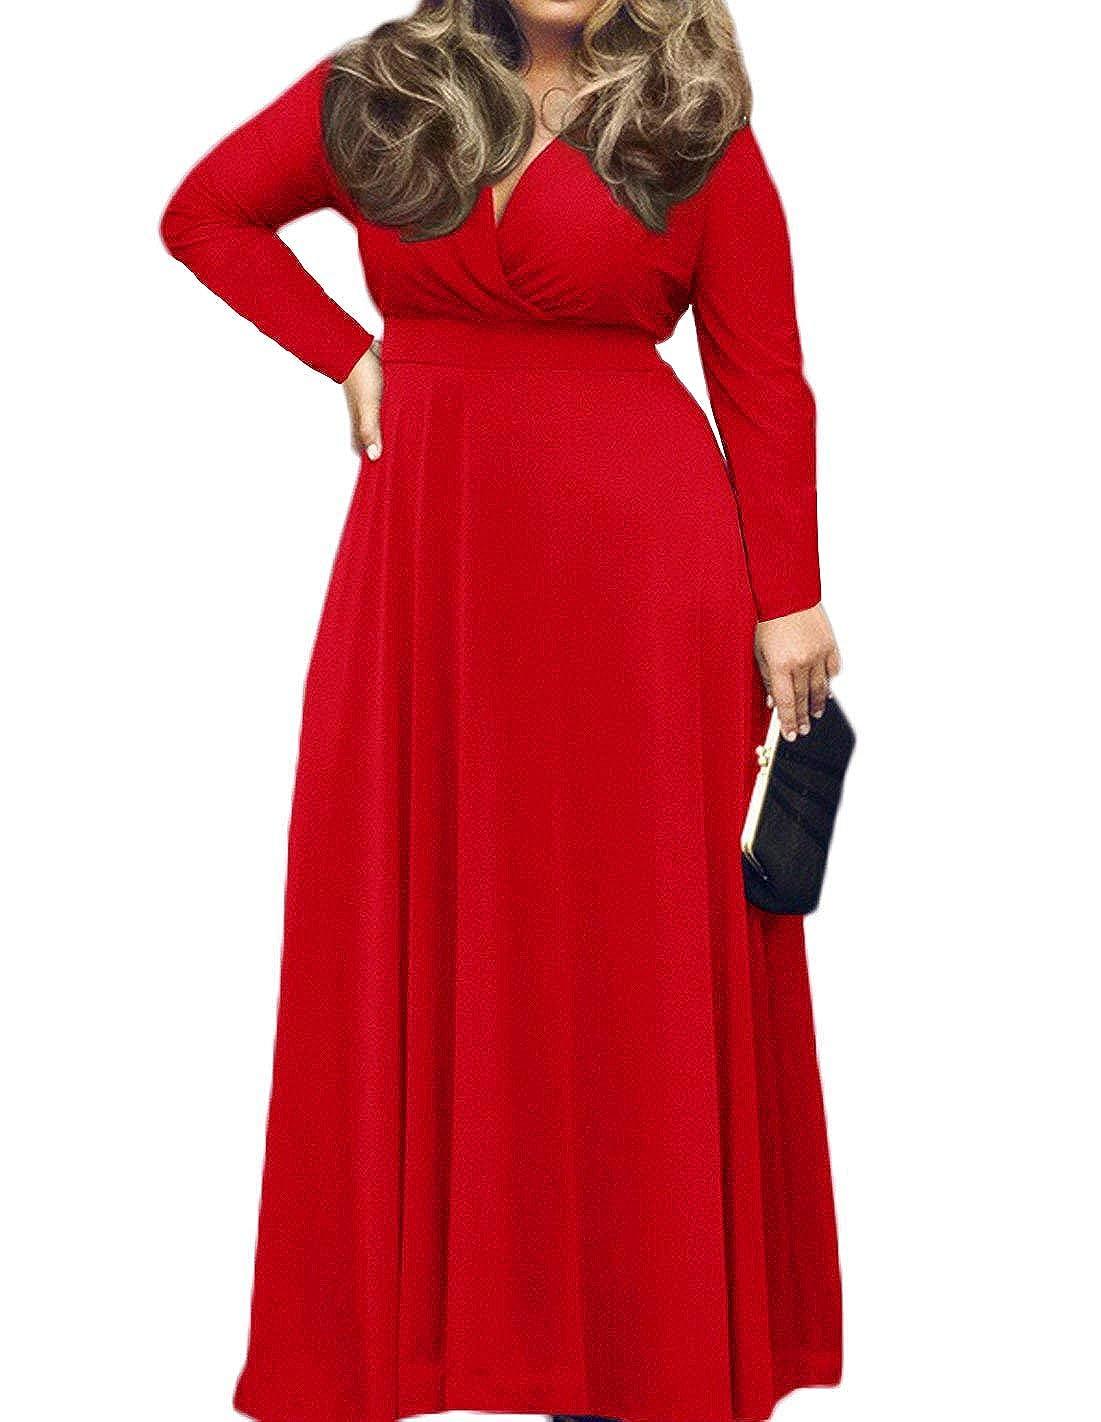 b86f393e62b POSESHE Women's L-4XL Solid V-Neck Long Sleeve Plus Size Maxi Dress